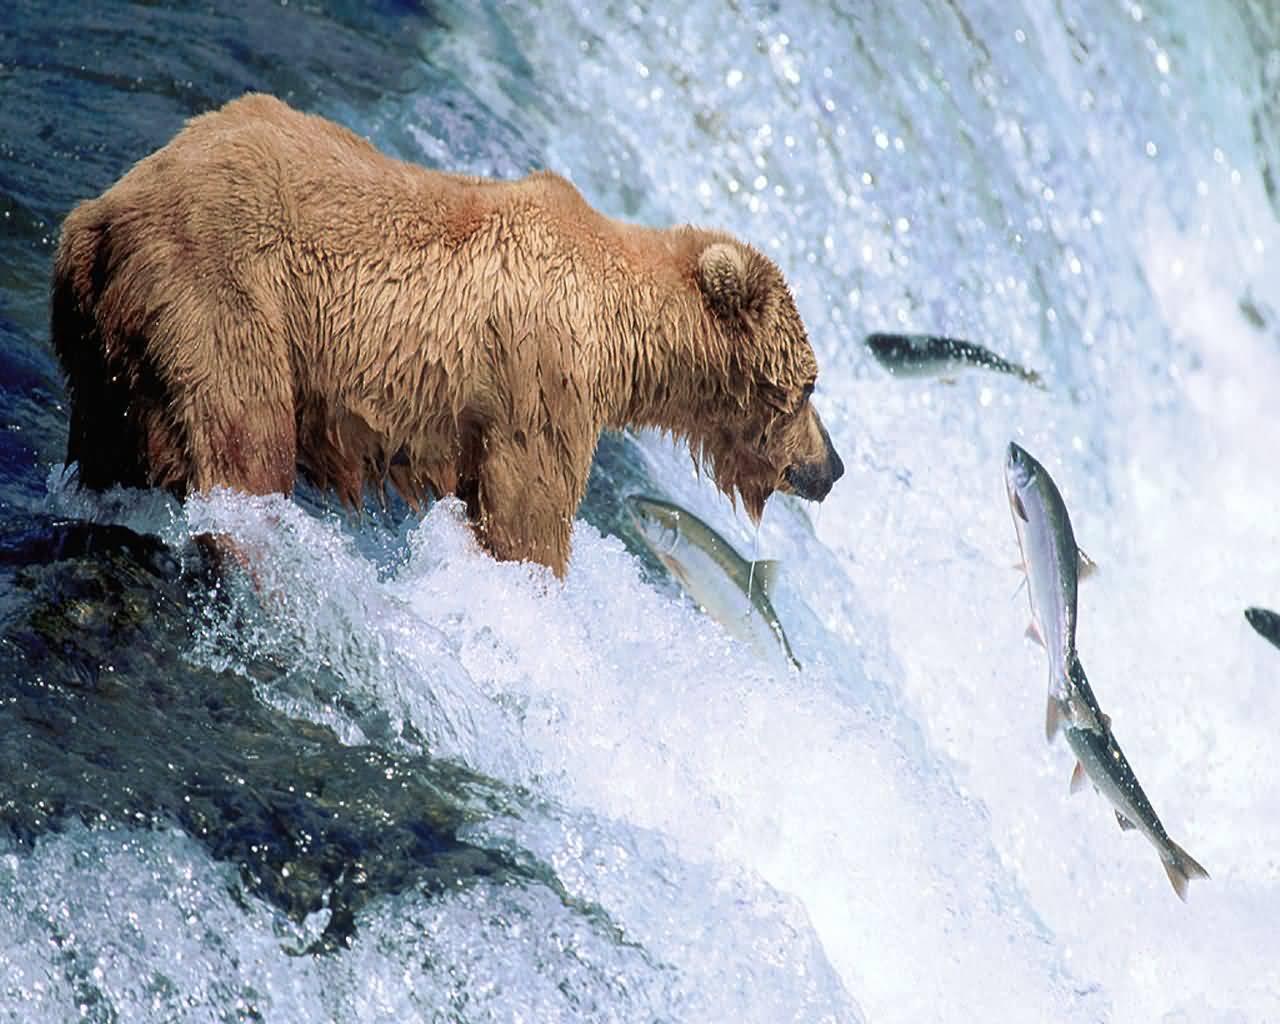 http://2.bp.blogspot.com/-vH8rbWOvqao/TaCQ9Tz1SvI/AAAAAAAAEik/13o25eq0BWw/s1600/grizzly_bear_gone_fishing-1280x1024.jpg